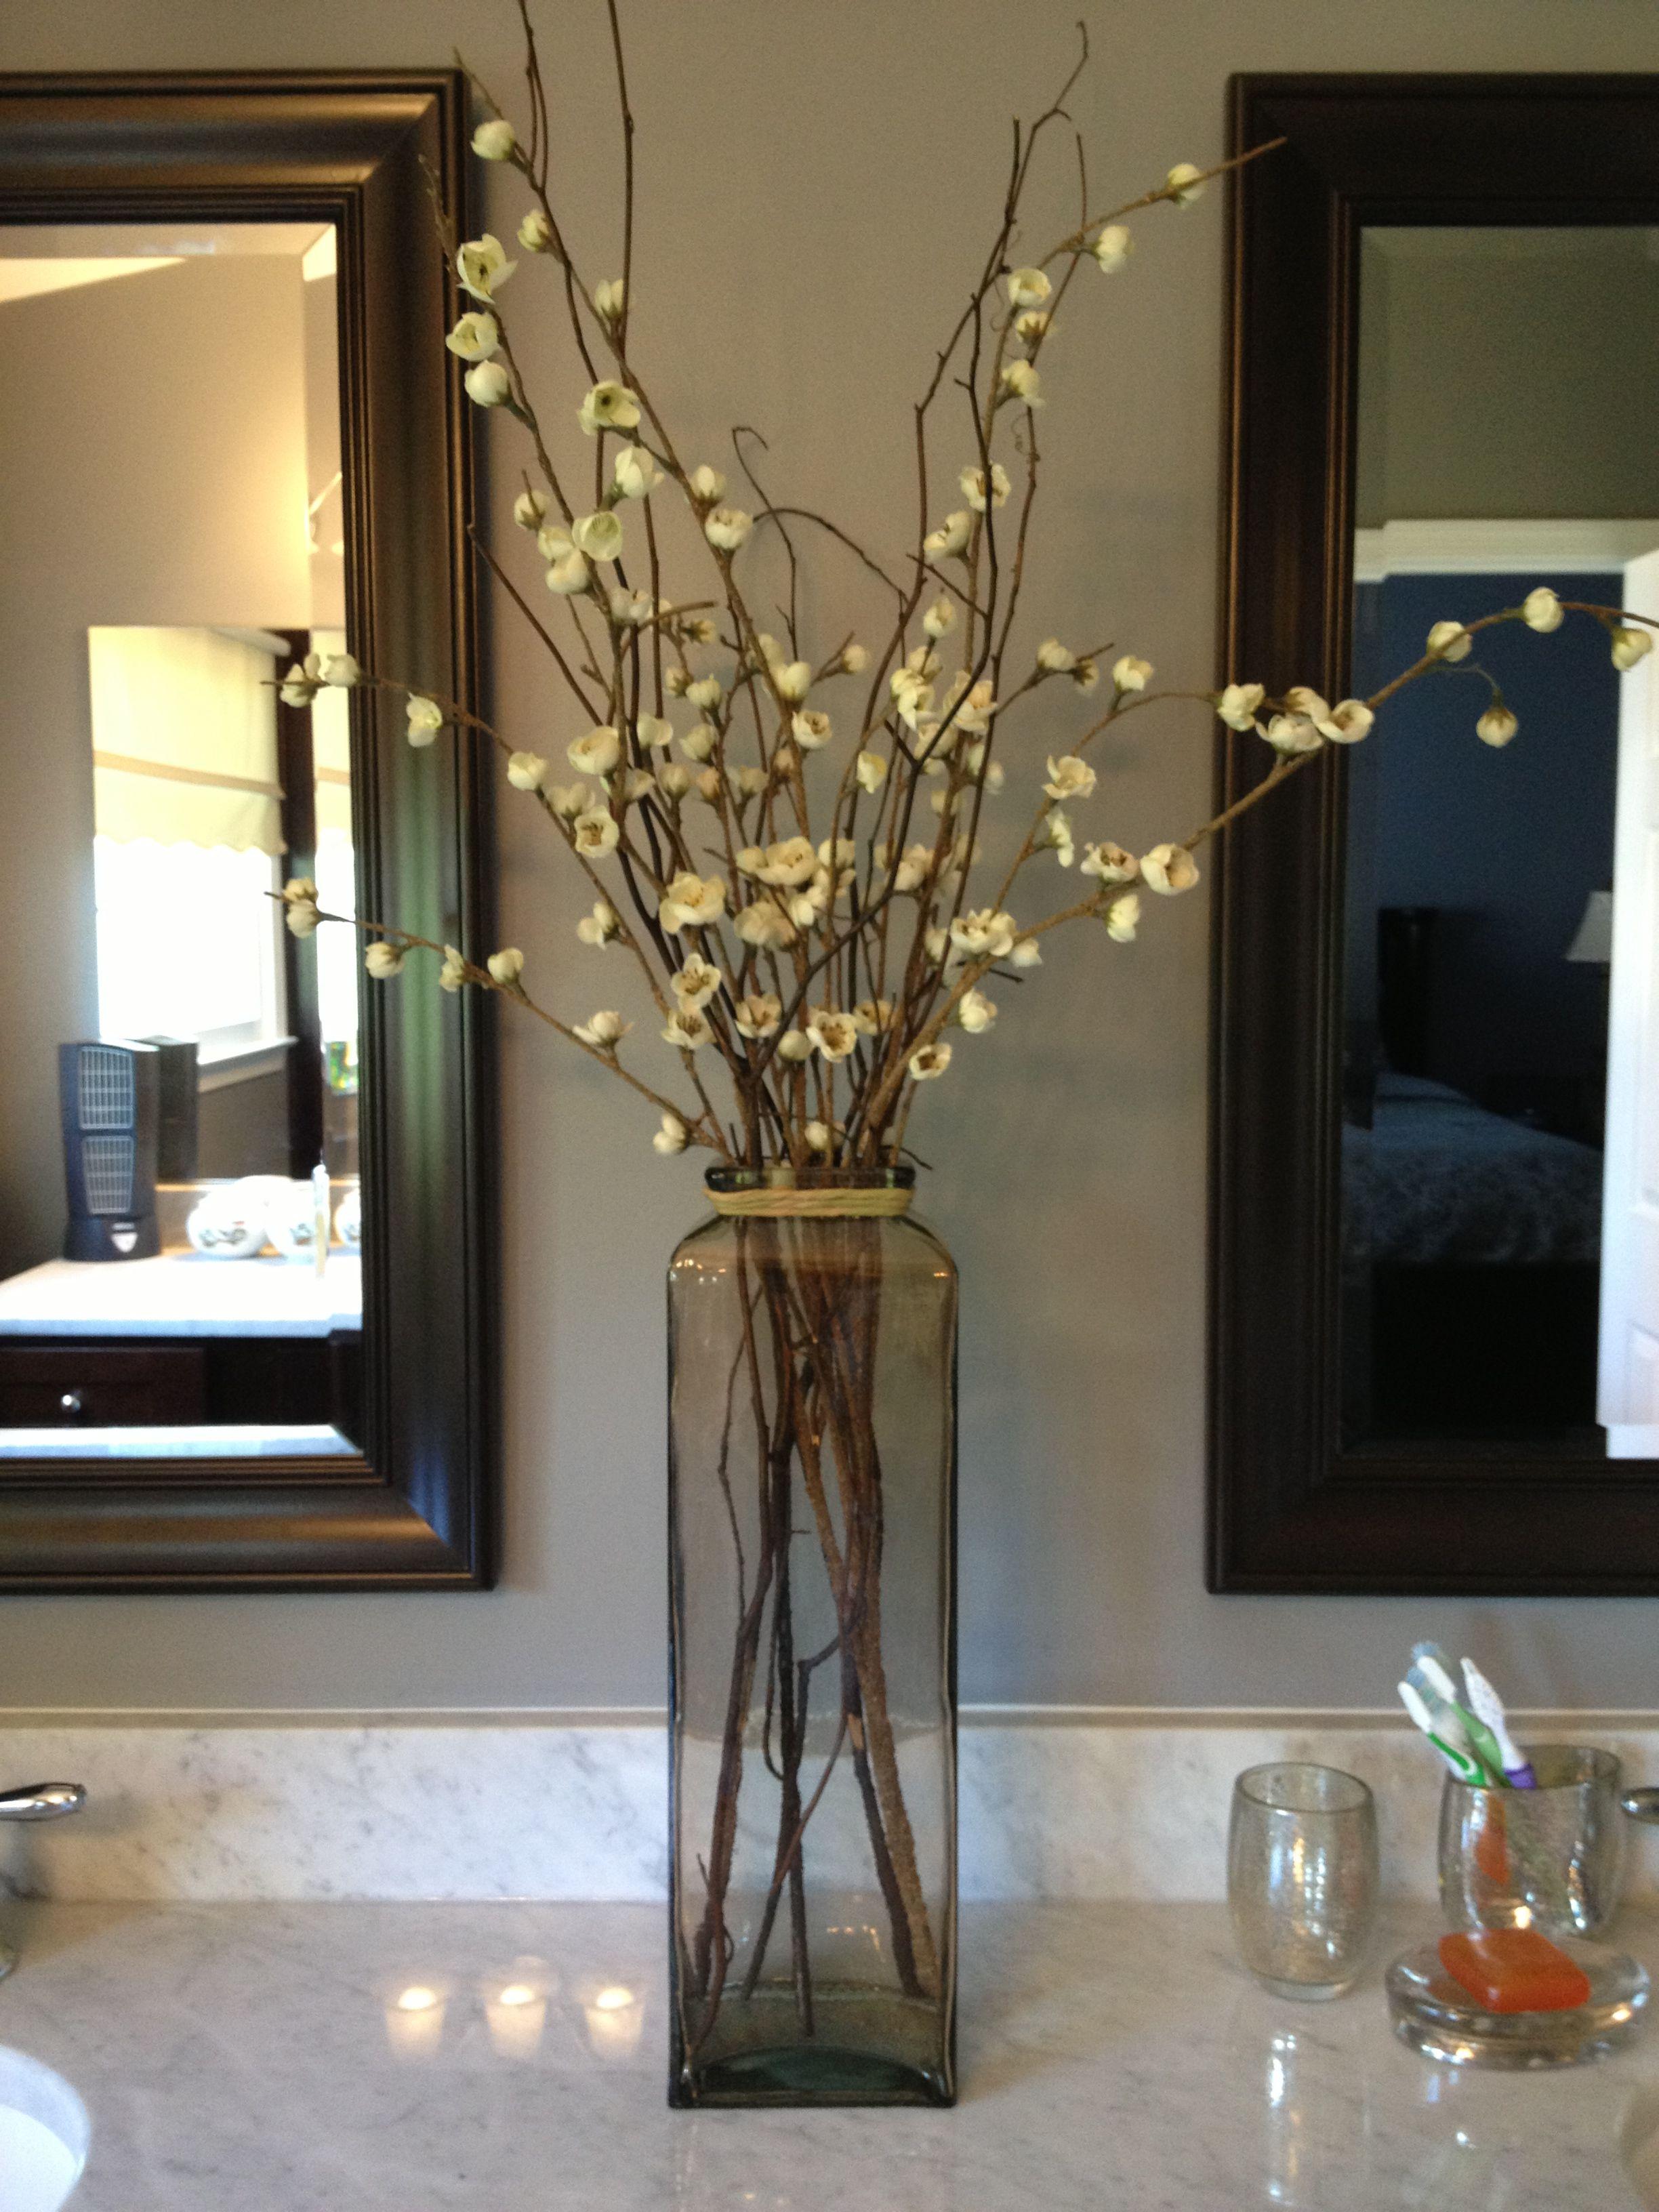 Bathroom Flowers Flower Arrangements, Bathroom Flower Arrangements Ideas